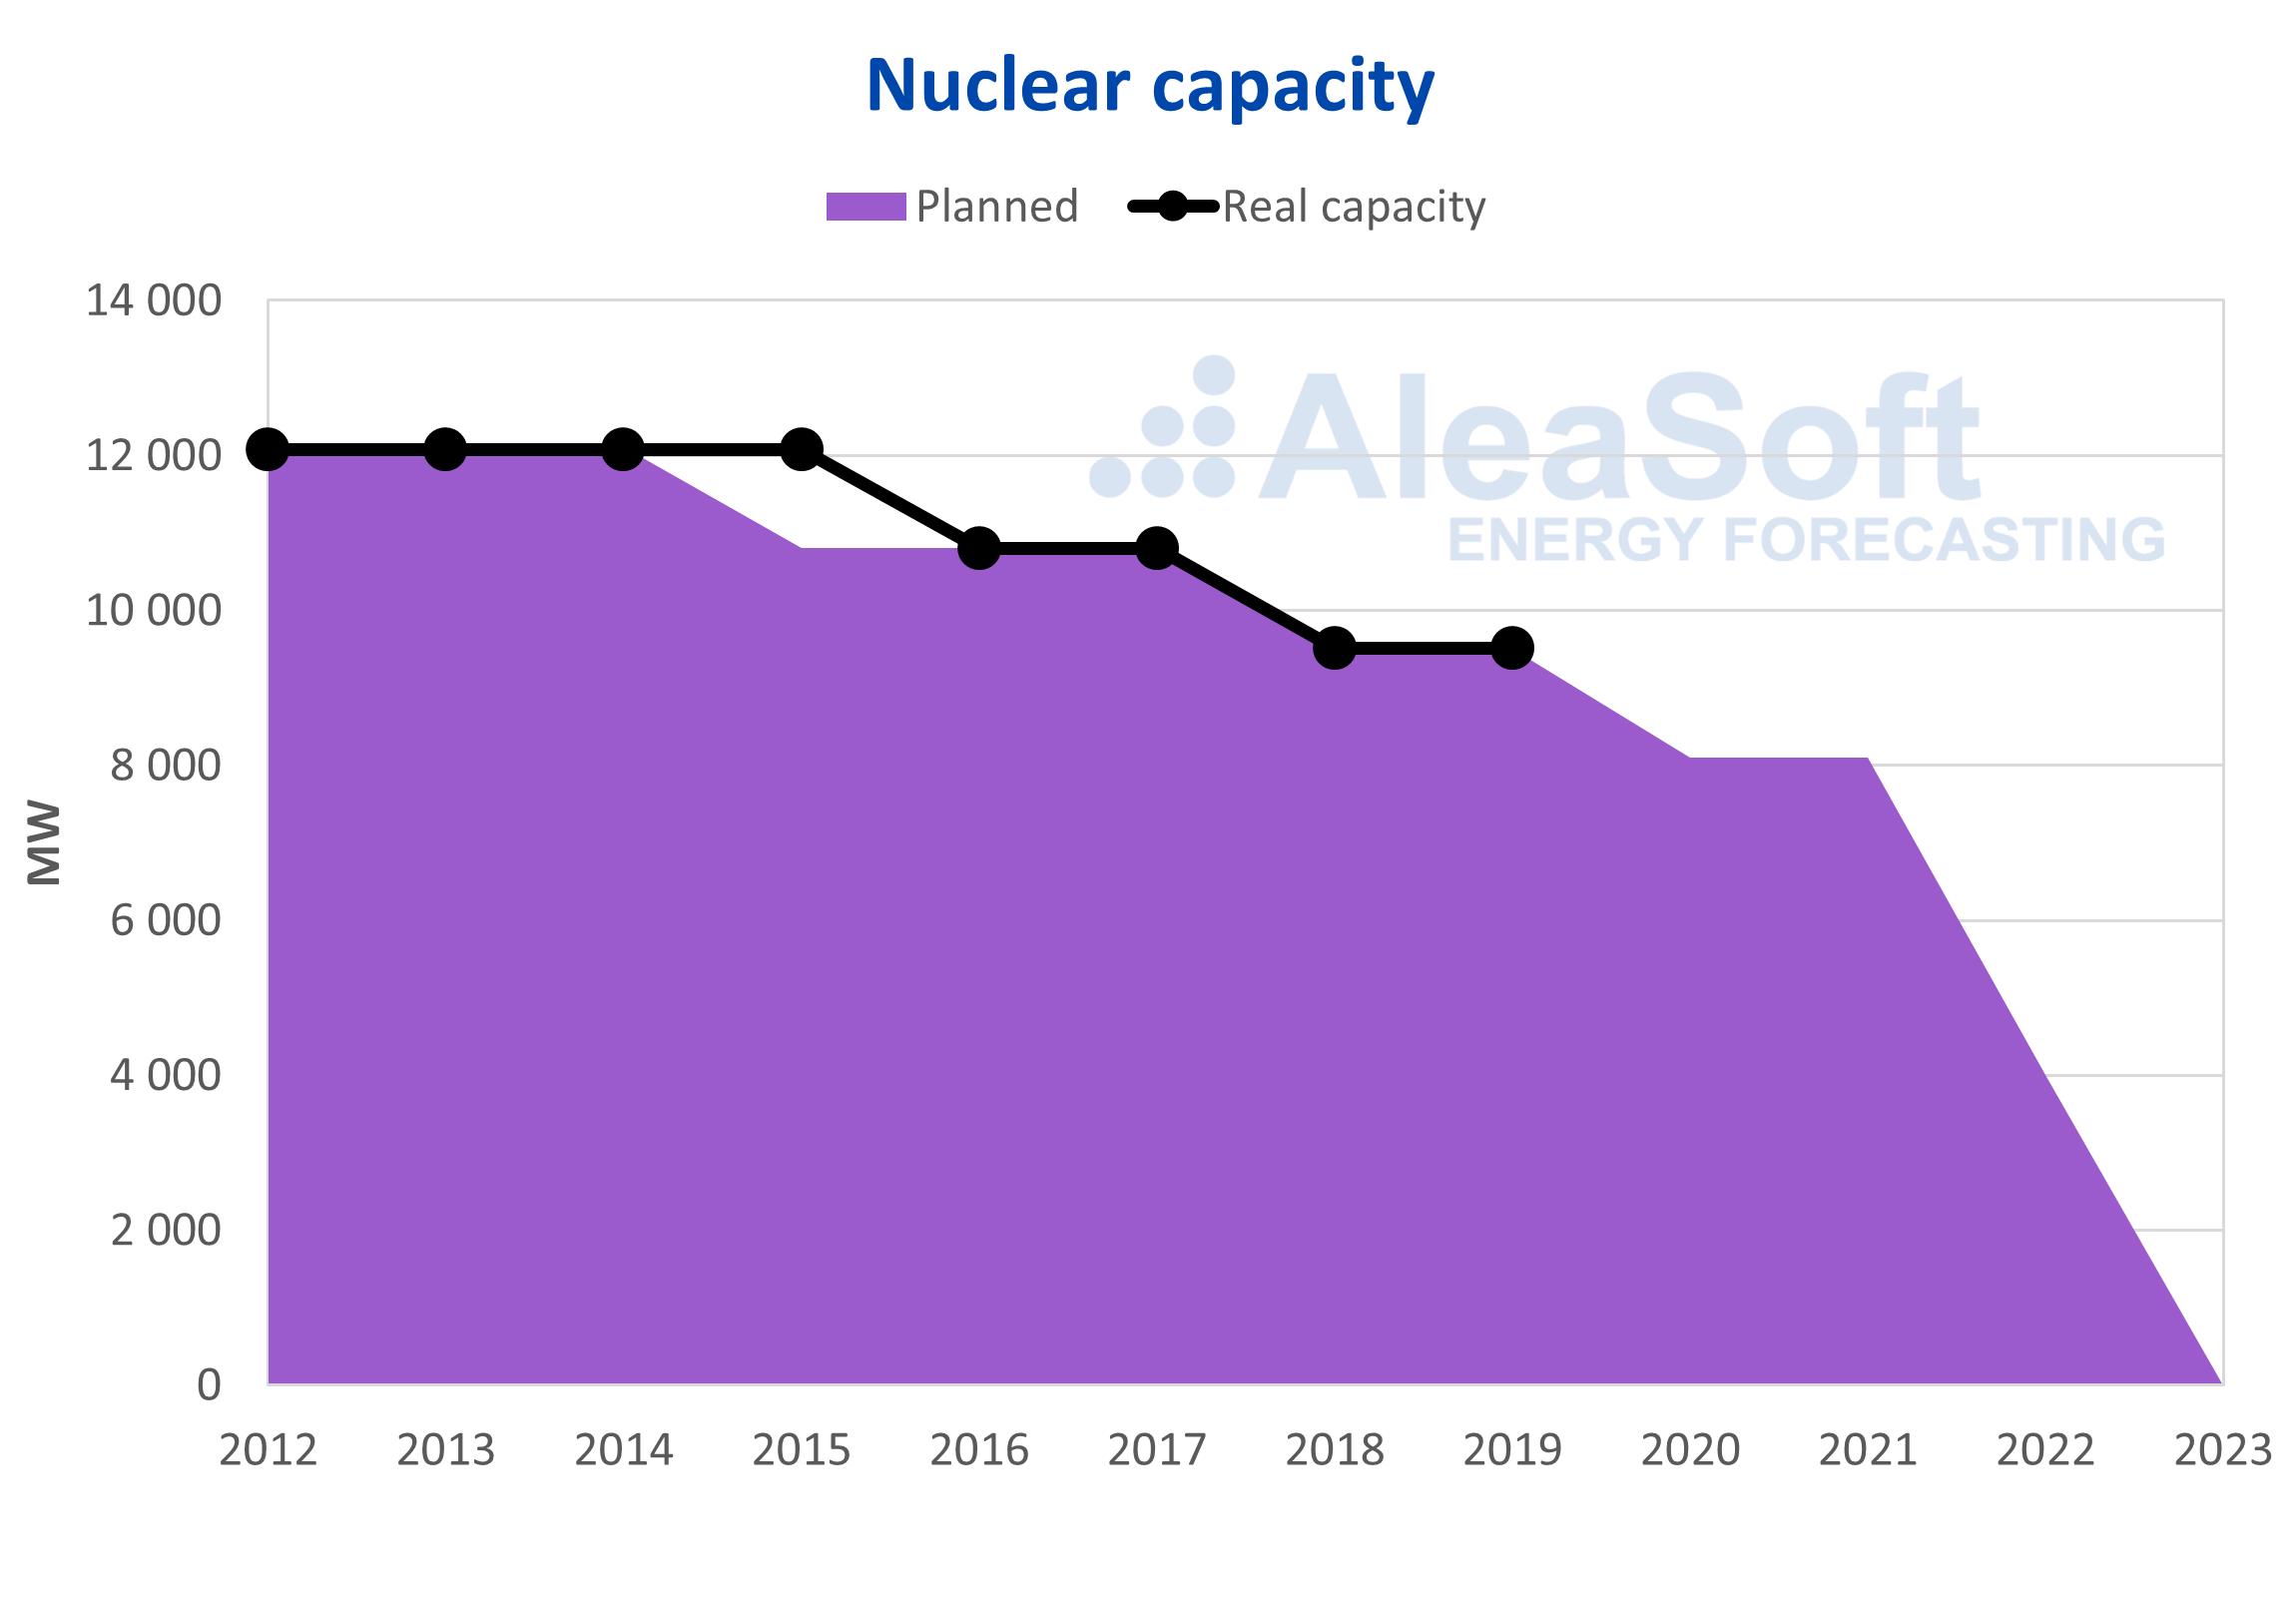 AleaSoft - Germany nuclear capacity plan